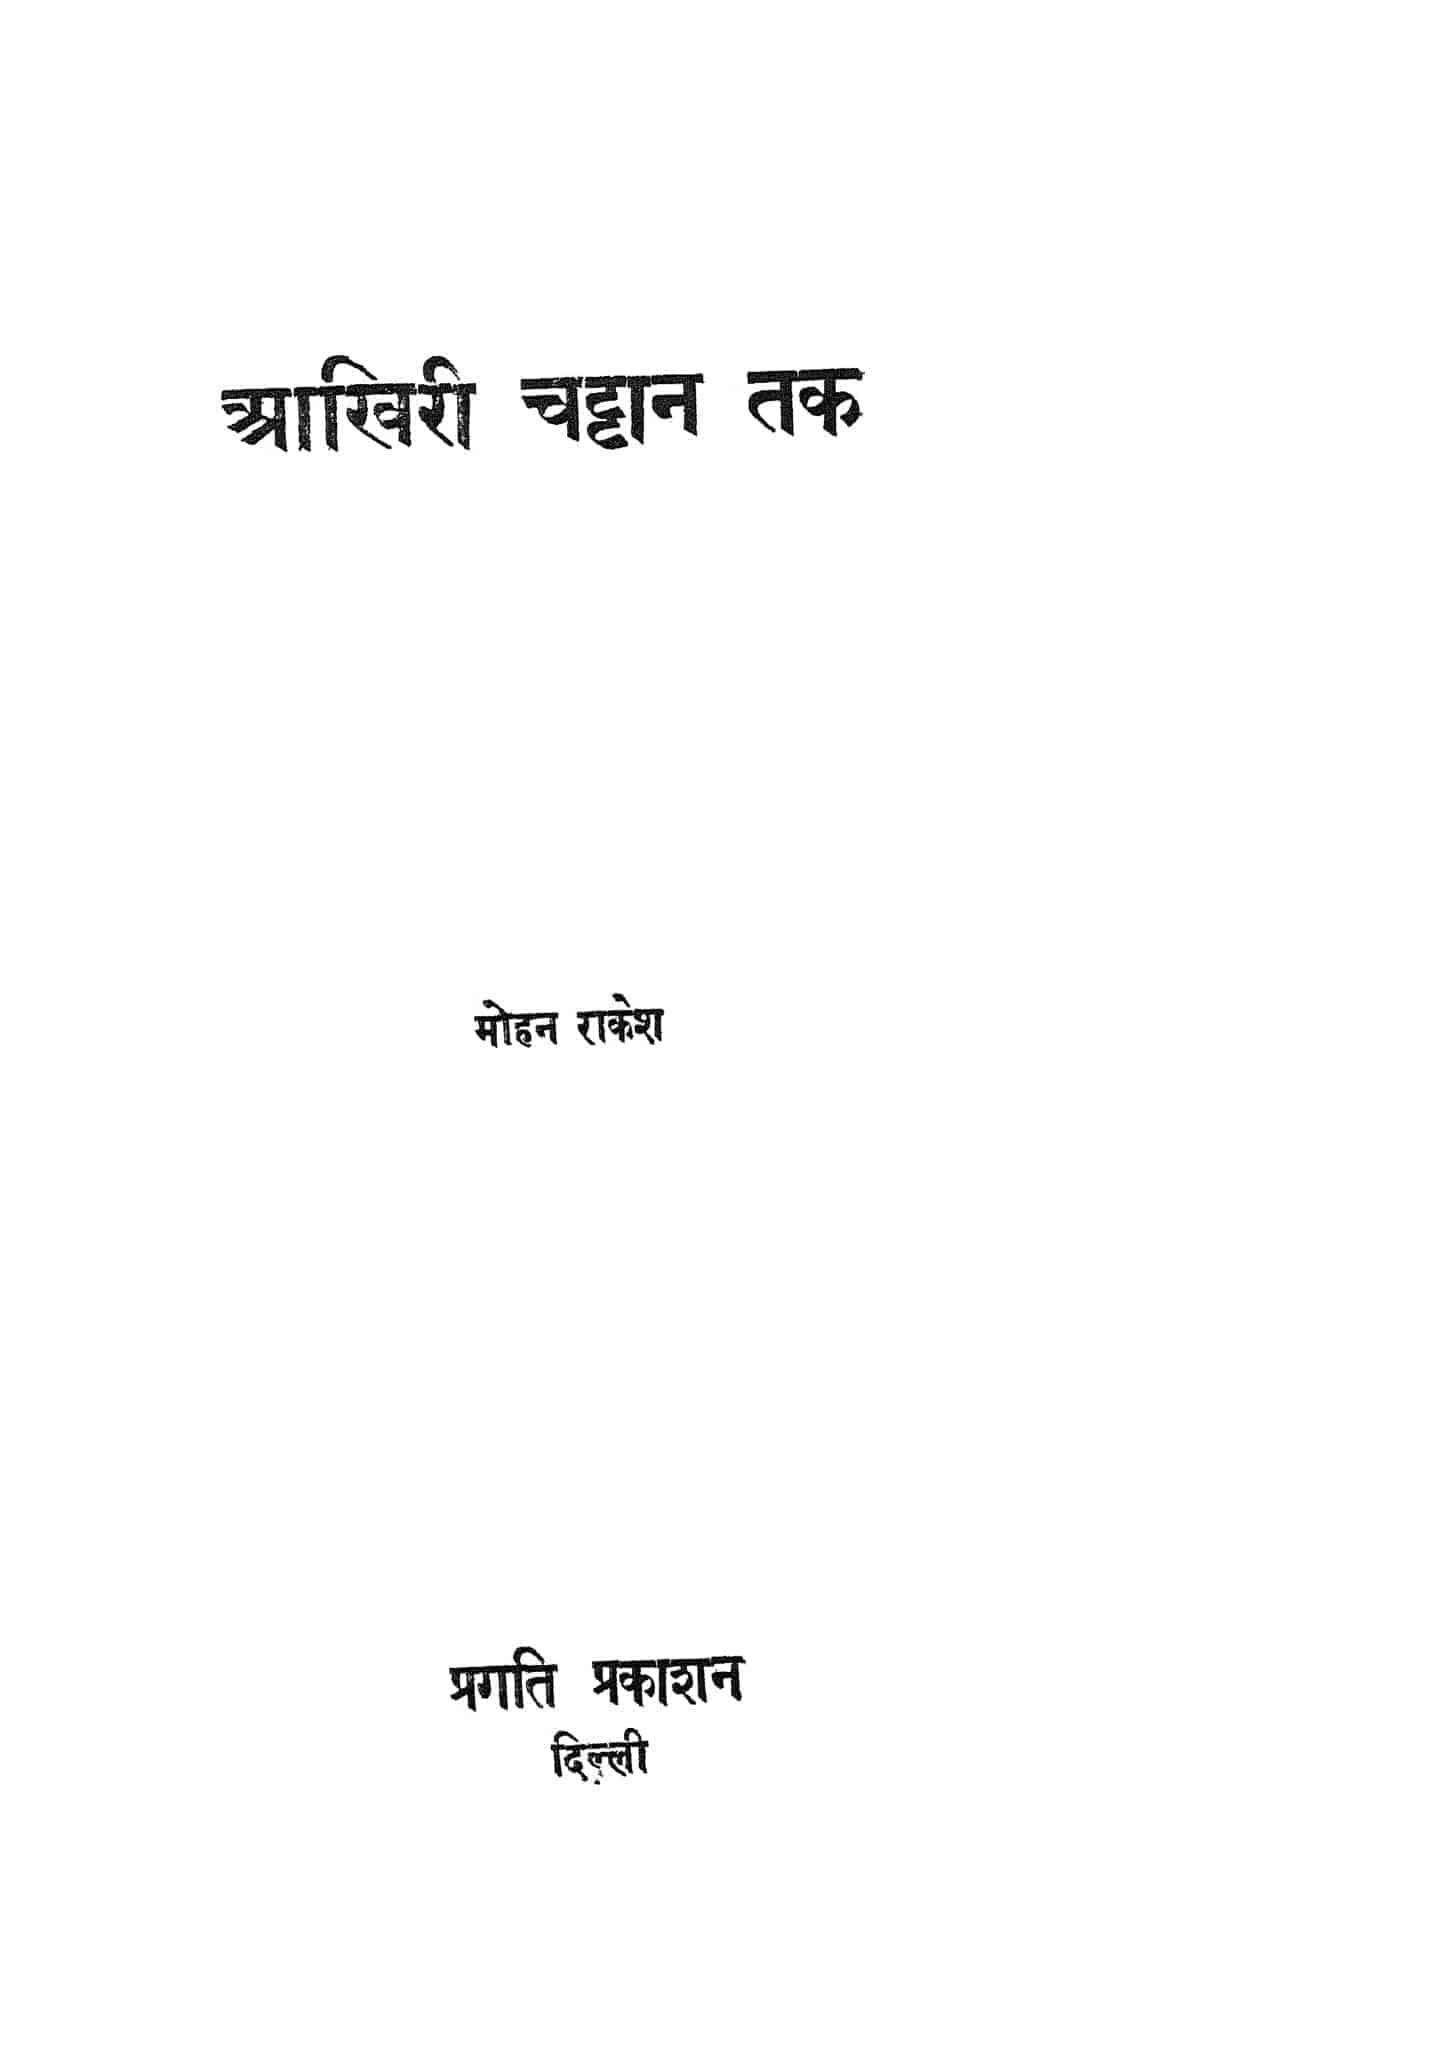 Aakhiri Chattan Tak by मोहन राकेश - Mohan Rakesh